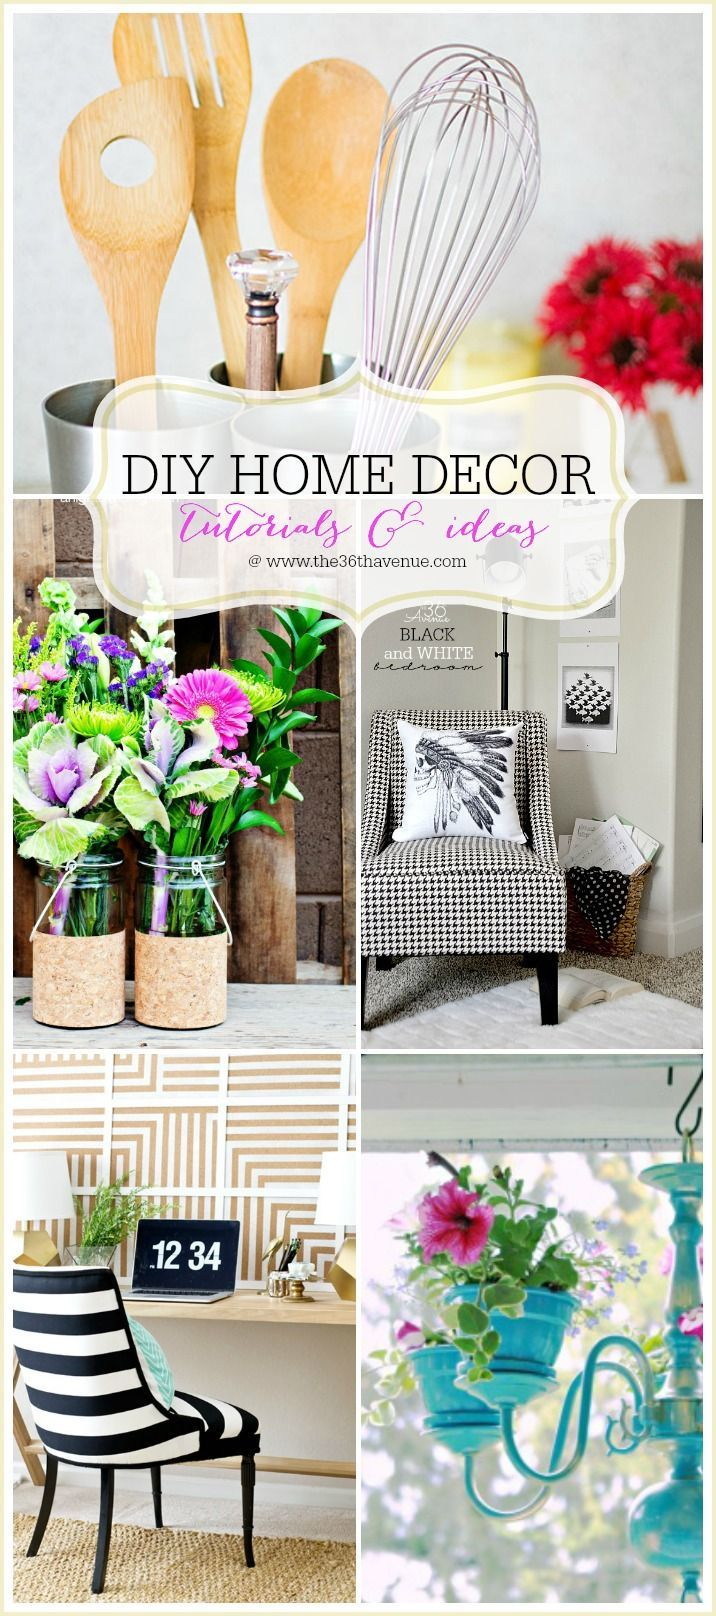 Home Decor DIY Projects Diy home decor, Easy diy